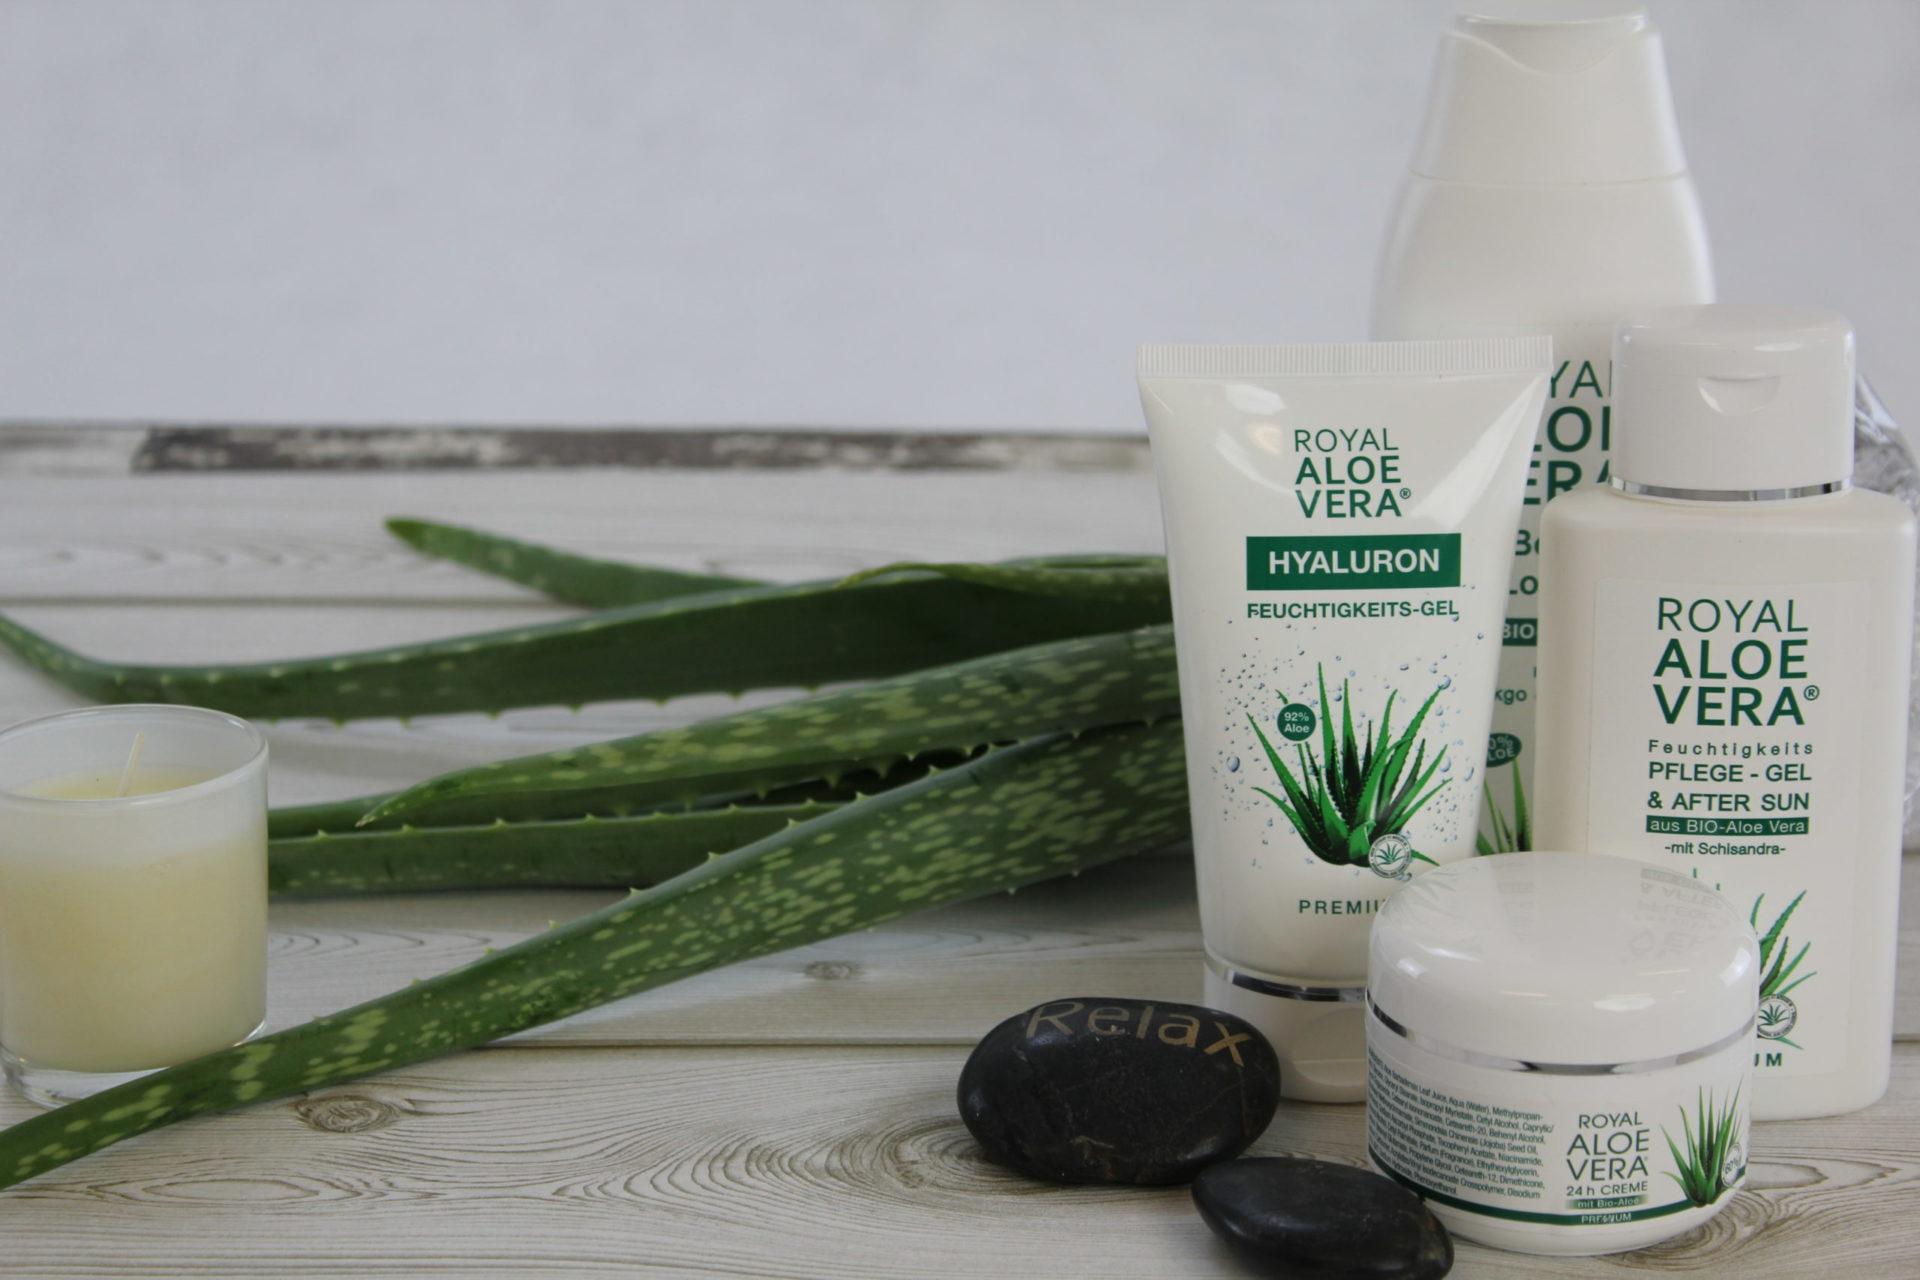 Royal-Aloe-Vera-Produkte-Startseite